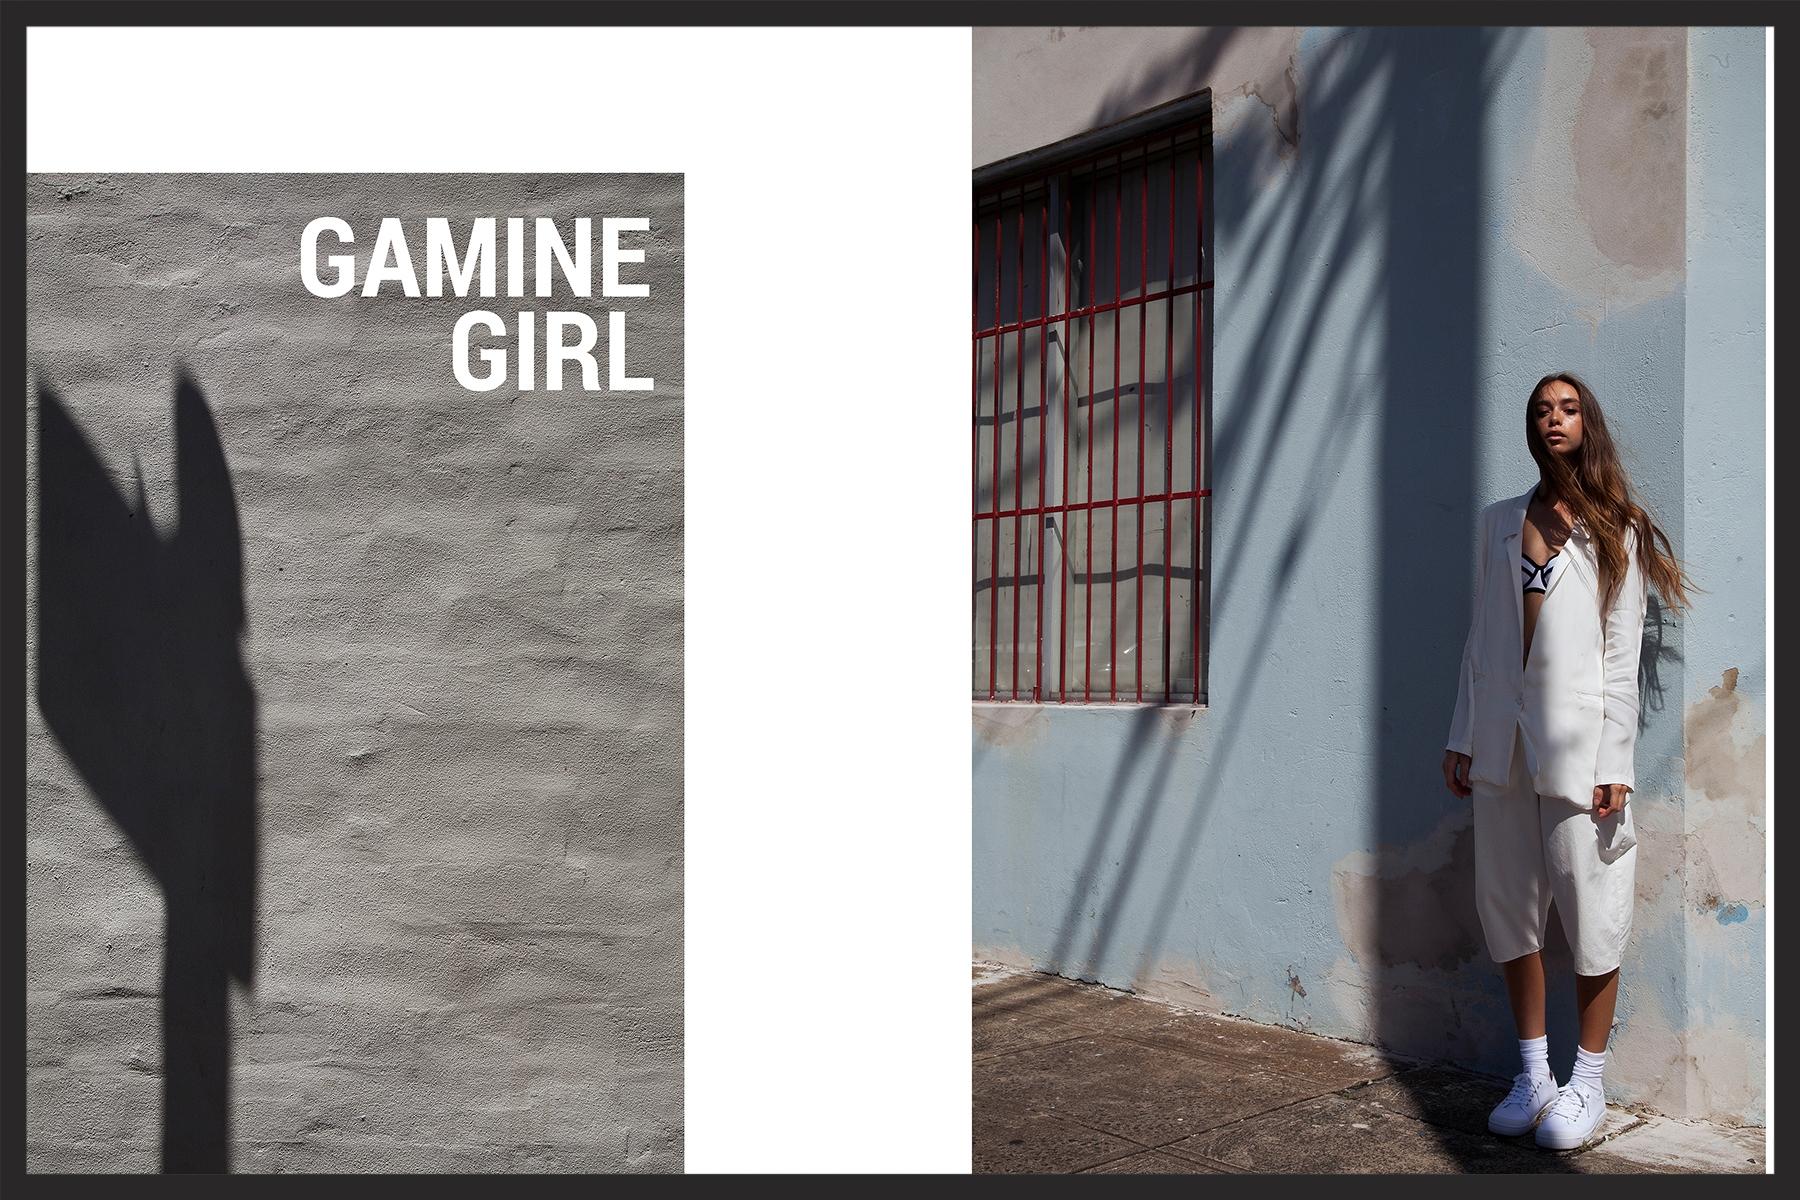 Gamine Girl